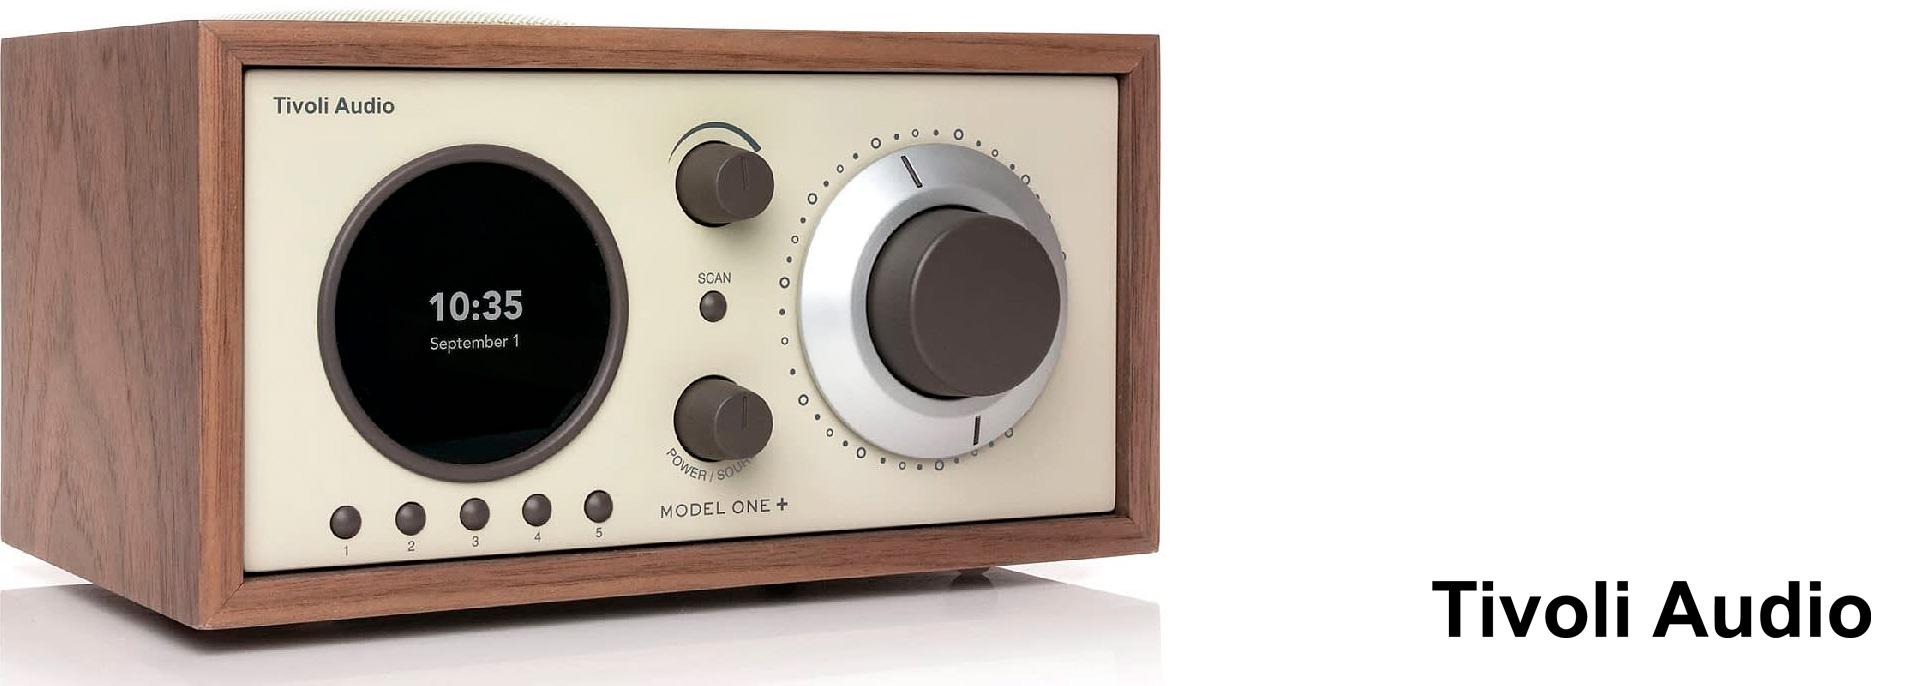 Tivoli Audio Model